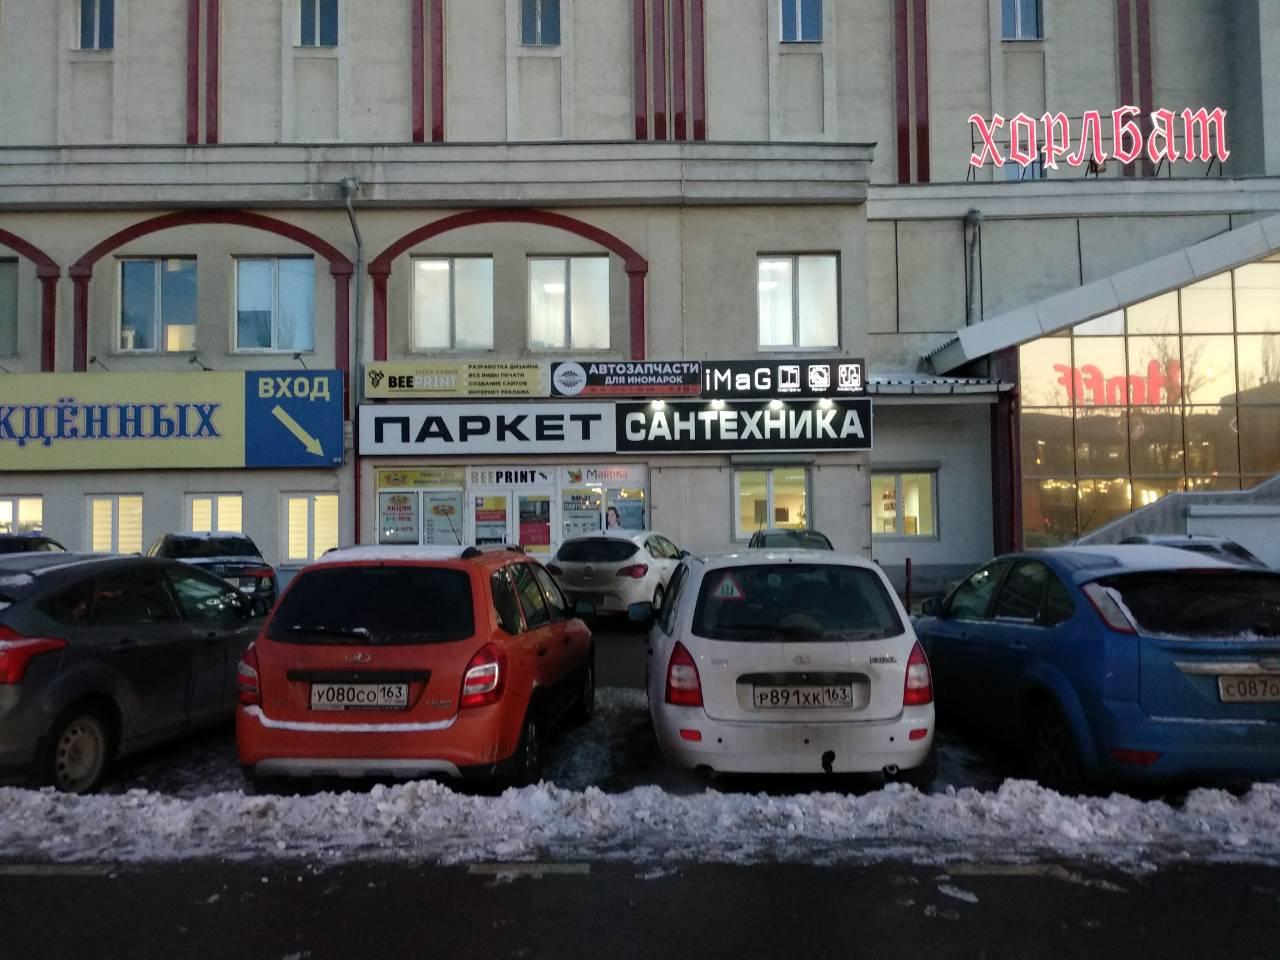 http://online-magazin-mebeli.ru/images/upload/IMG-488b68f4d5e3769c9ea1fd89b0f32a3c-V.jpg